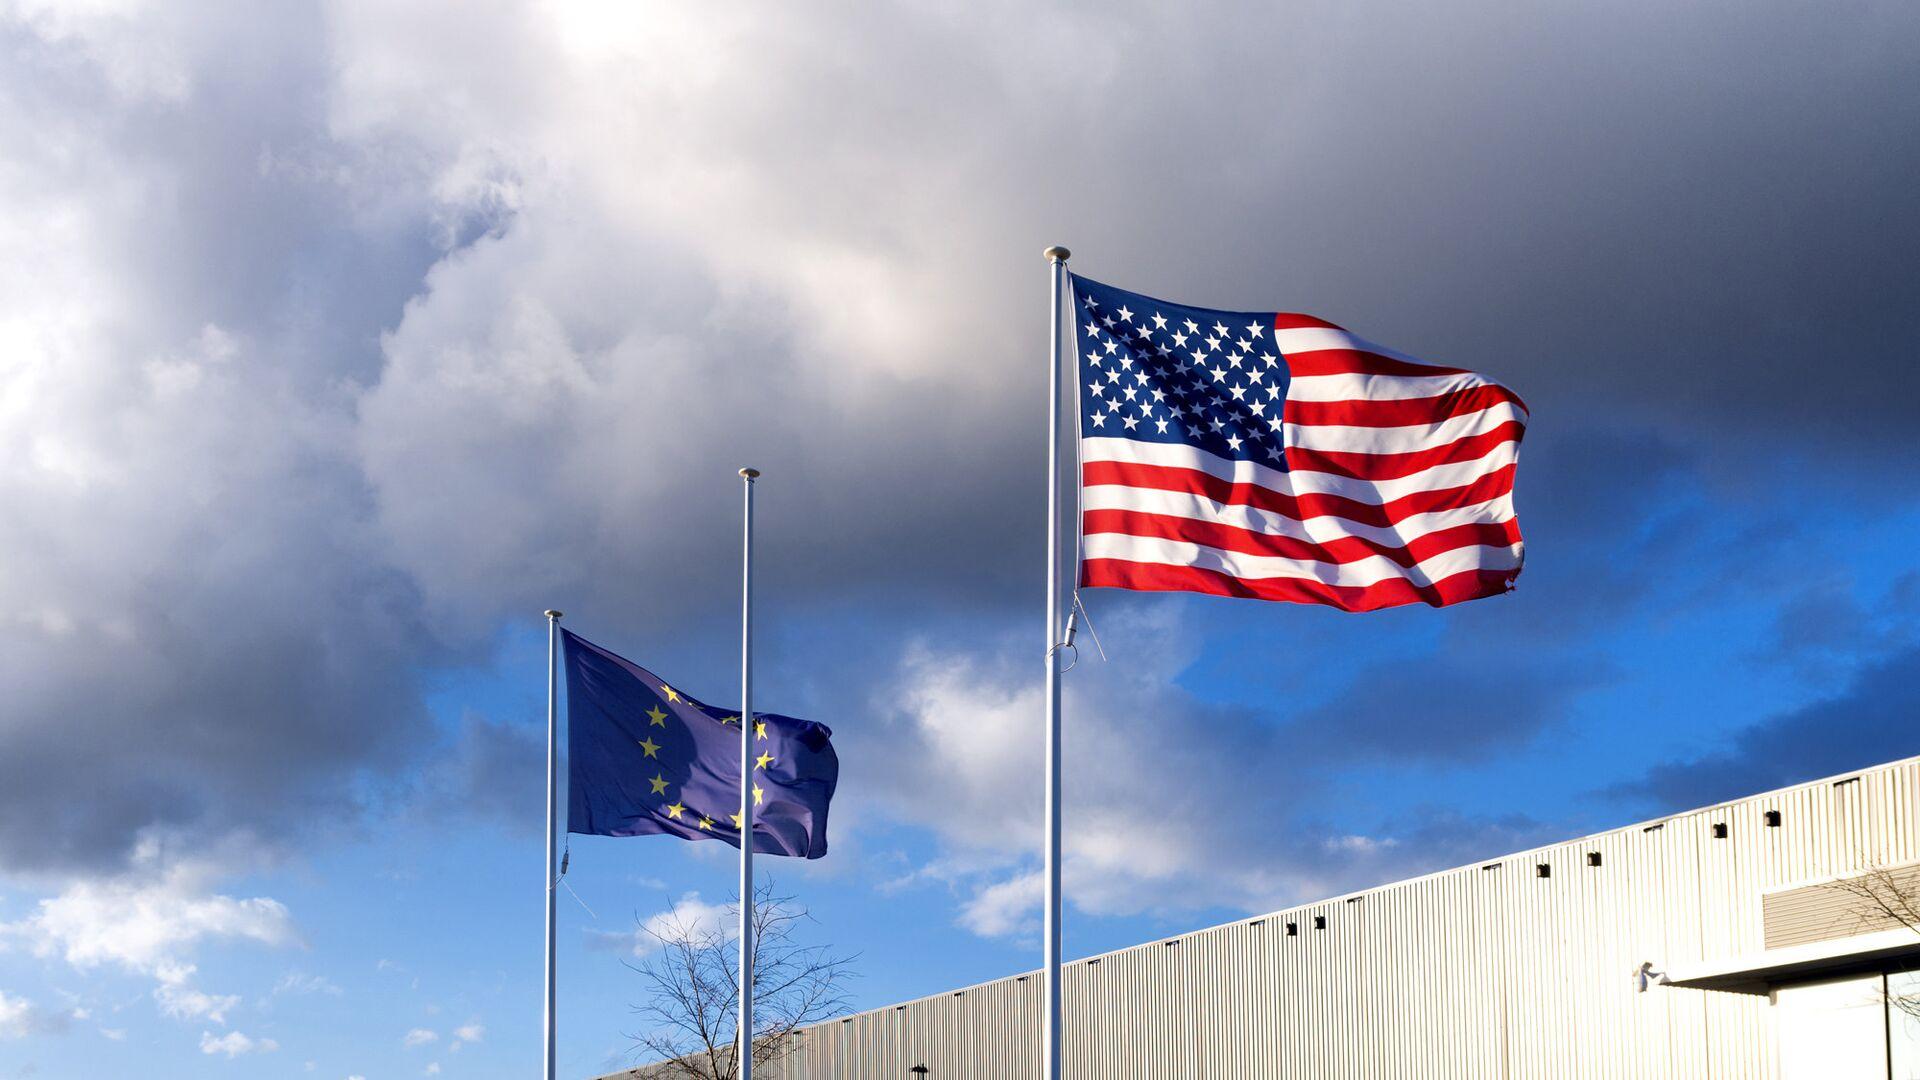 Флаги США и Евросоюза - РИА Новости, 1920, 17.11.2020